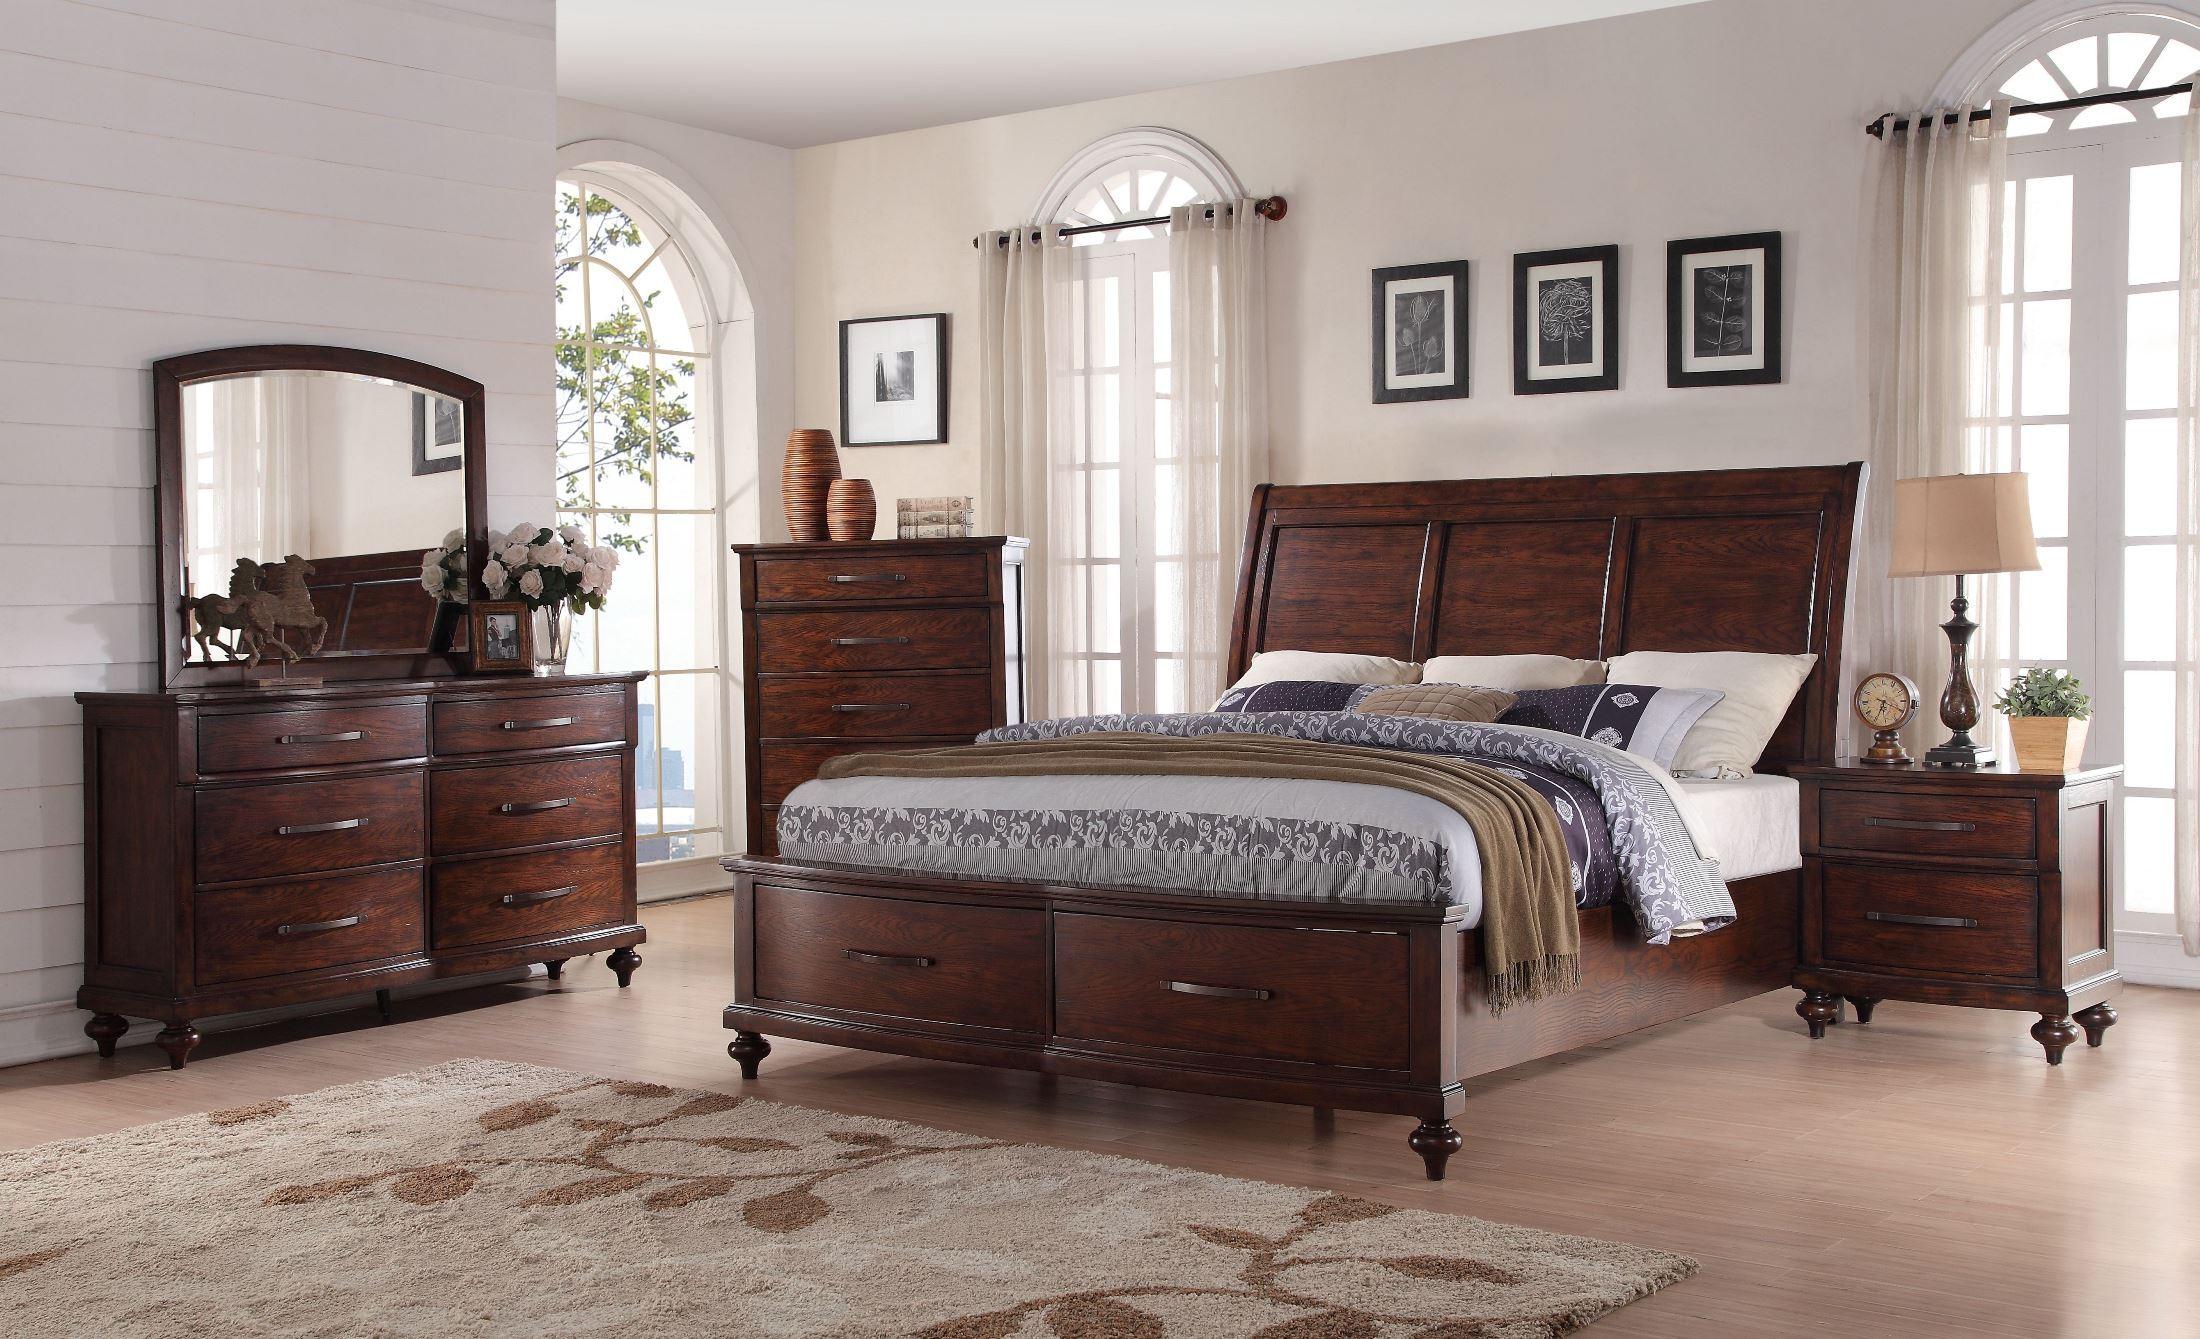 La Jolla Ranchero Brown Sleigh Storage Bedroom Set From New Classic Coleman Furniture